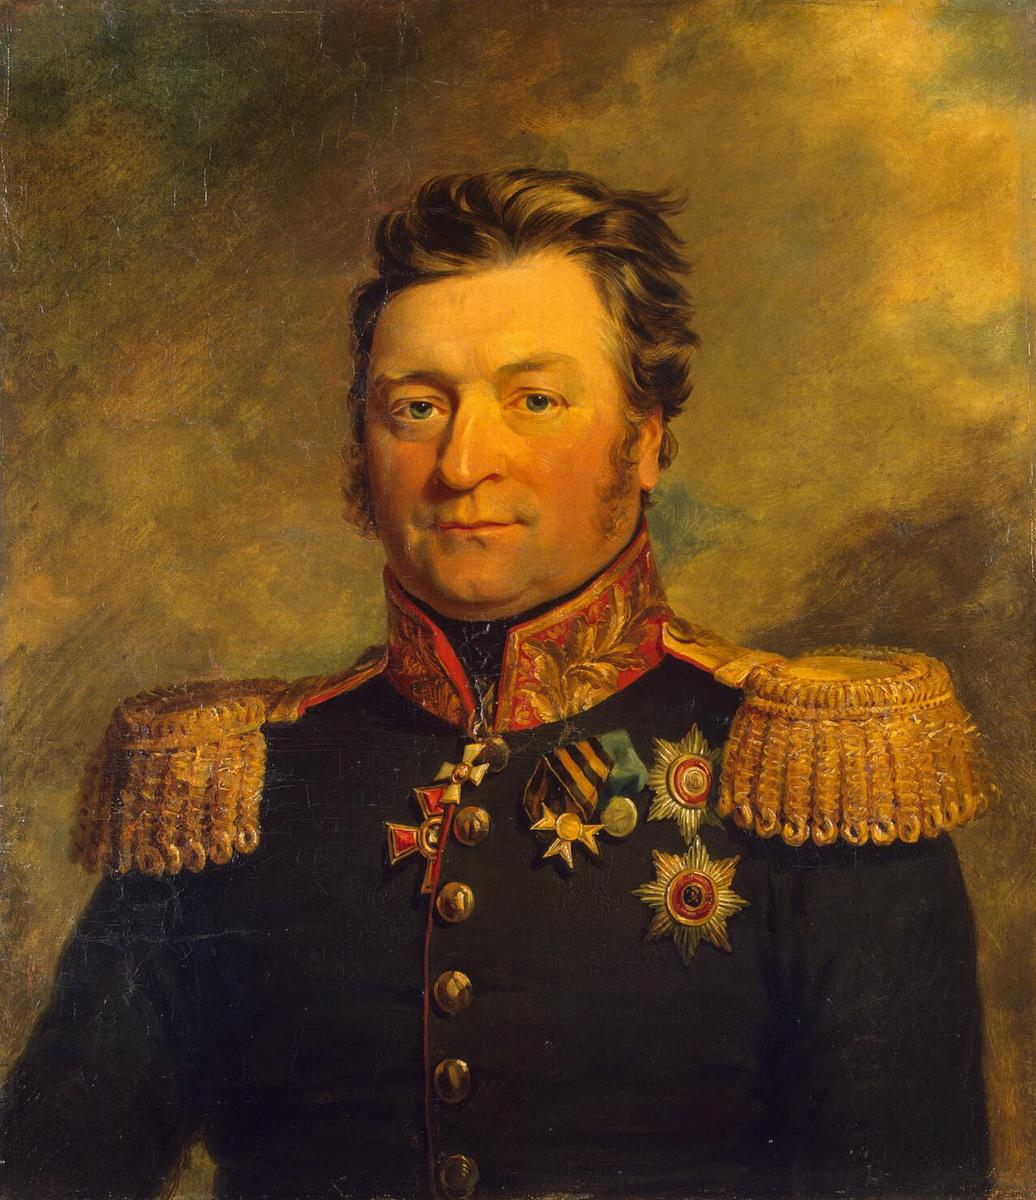 Джордж Доу. Портрет Александра Львовича Воинова